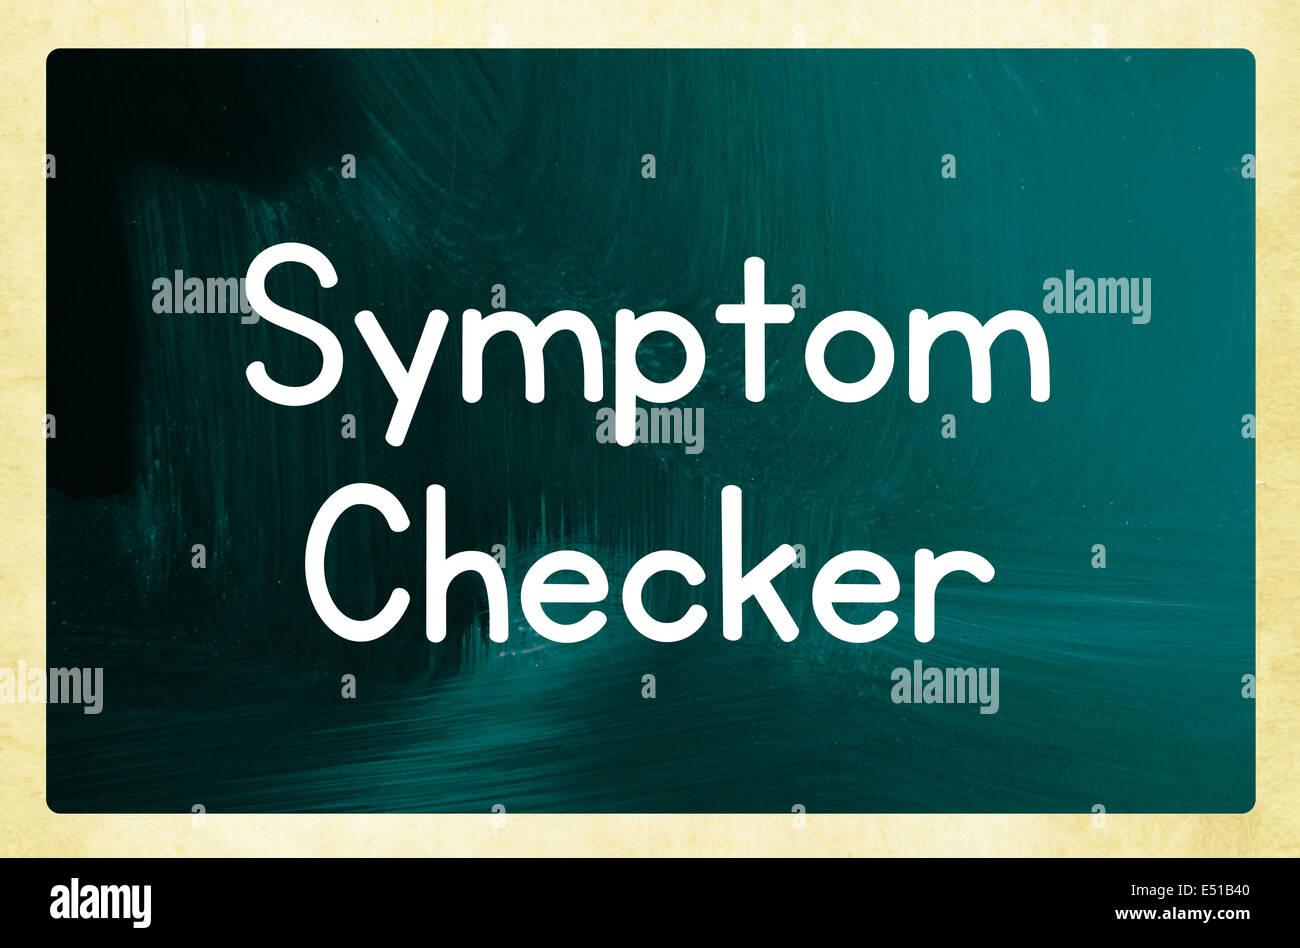 symptom checker - Stock Image